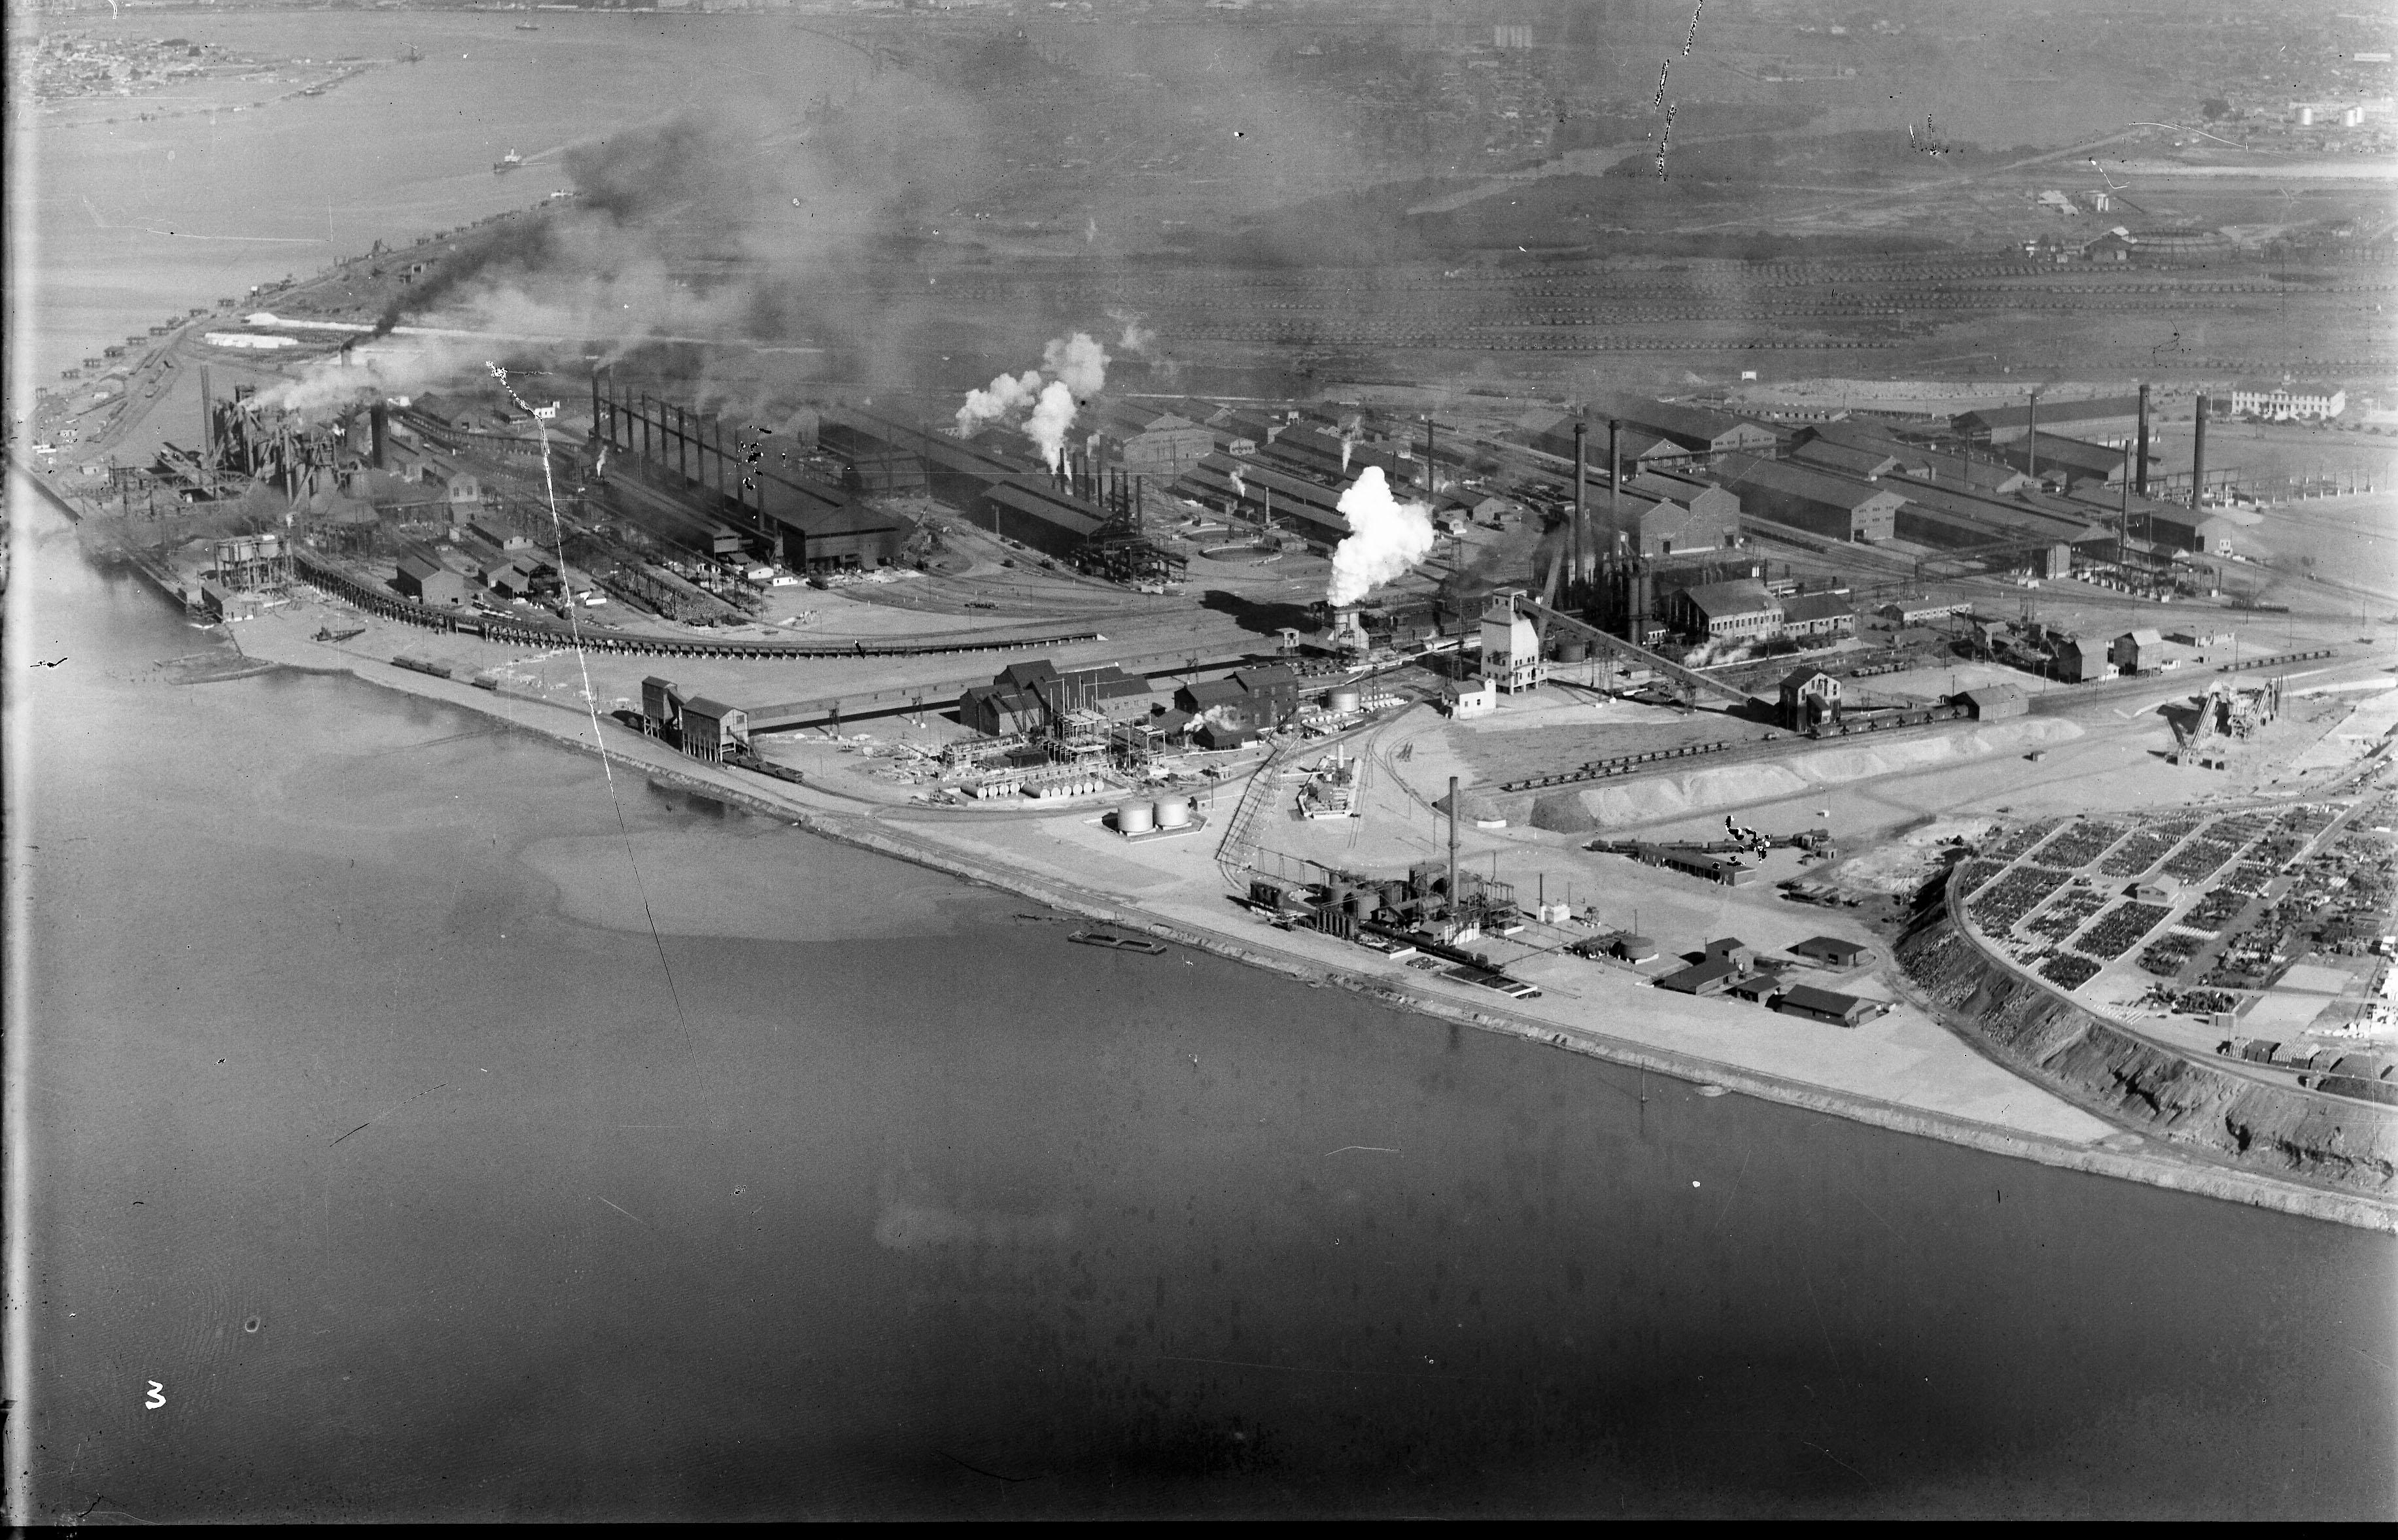 Newcastle aerial, 1935 (Image 64 Courtesy of Phillip Warren)